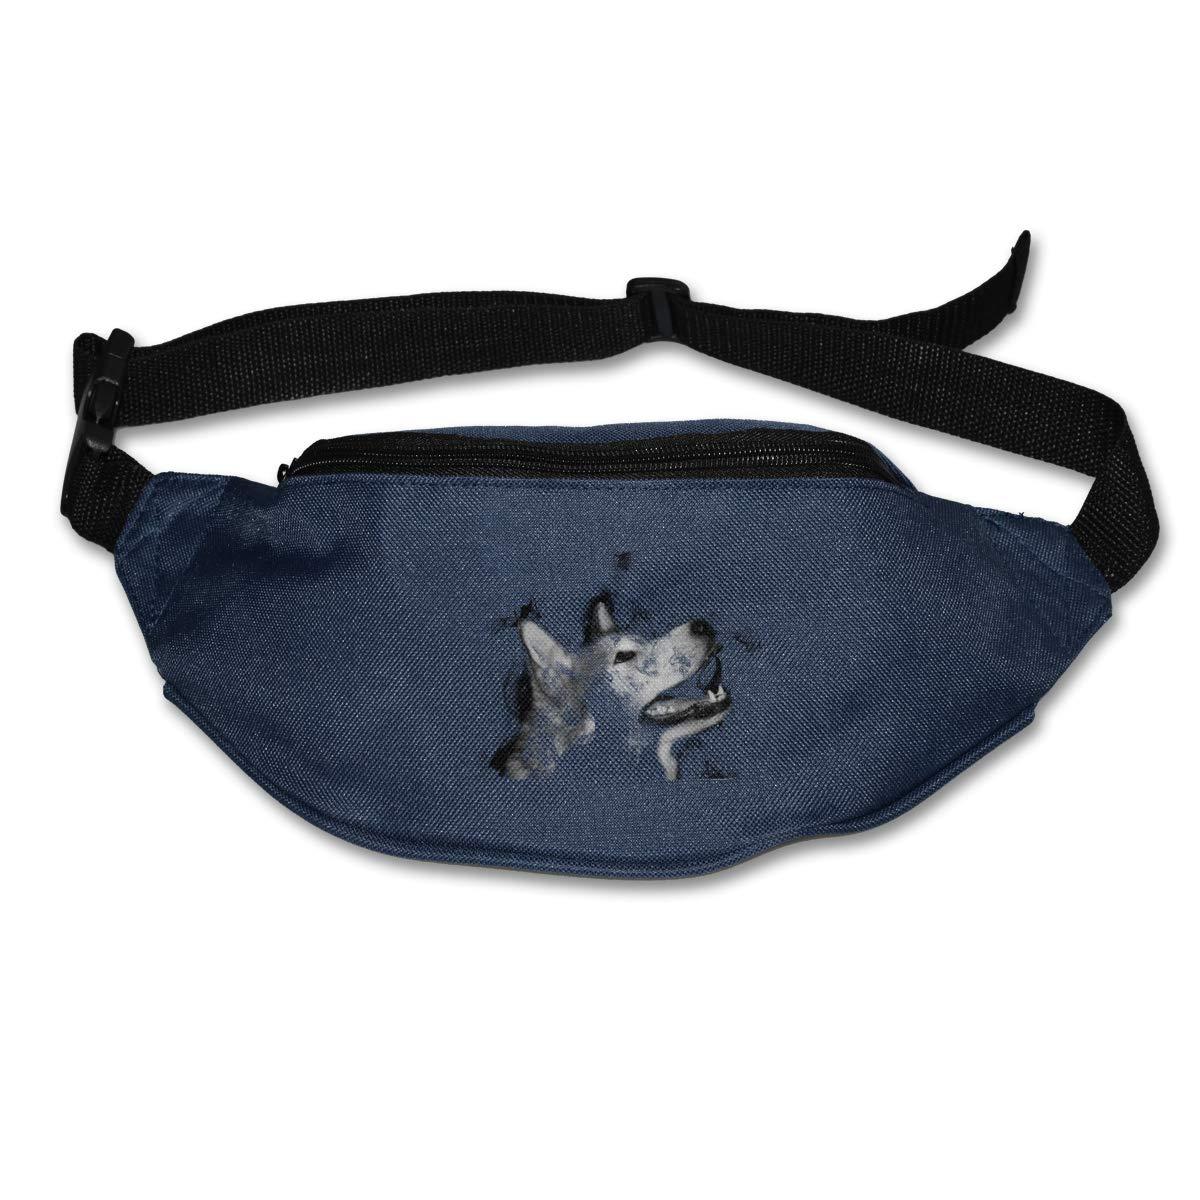 Magical Alaskan Malamute Sport Waist Bag Fanny Pack Adjustable For Travel